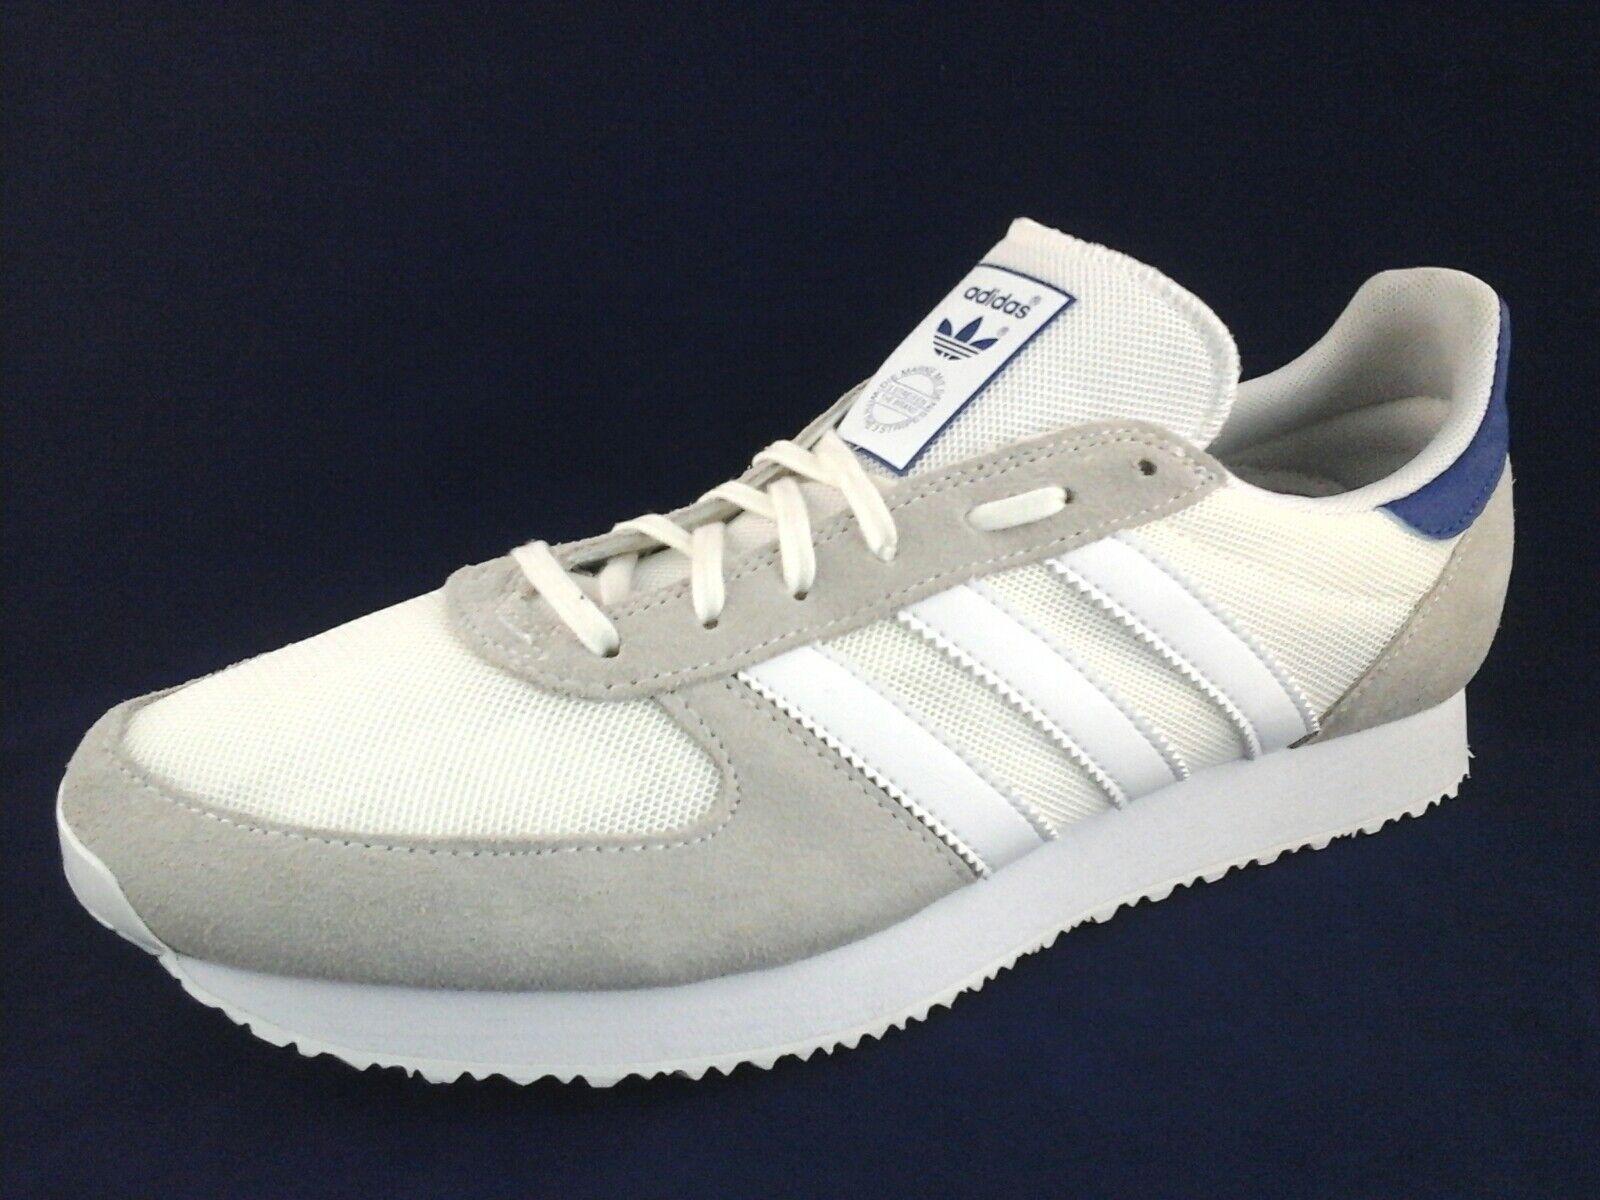 Originals Zx Adidas Chaussures Sneakers Racer S32230 Femme 0PwUwqdz